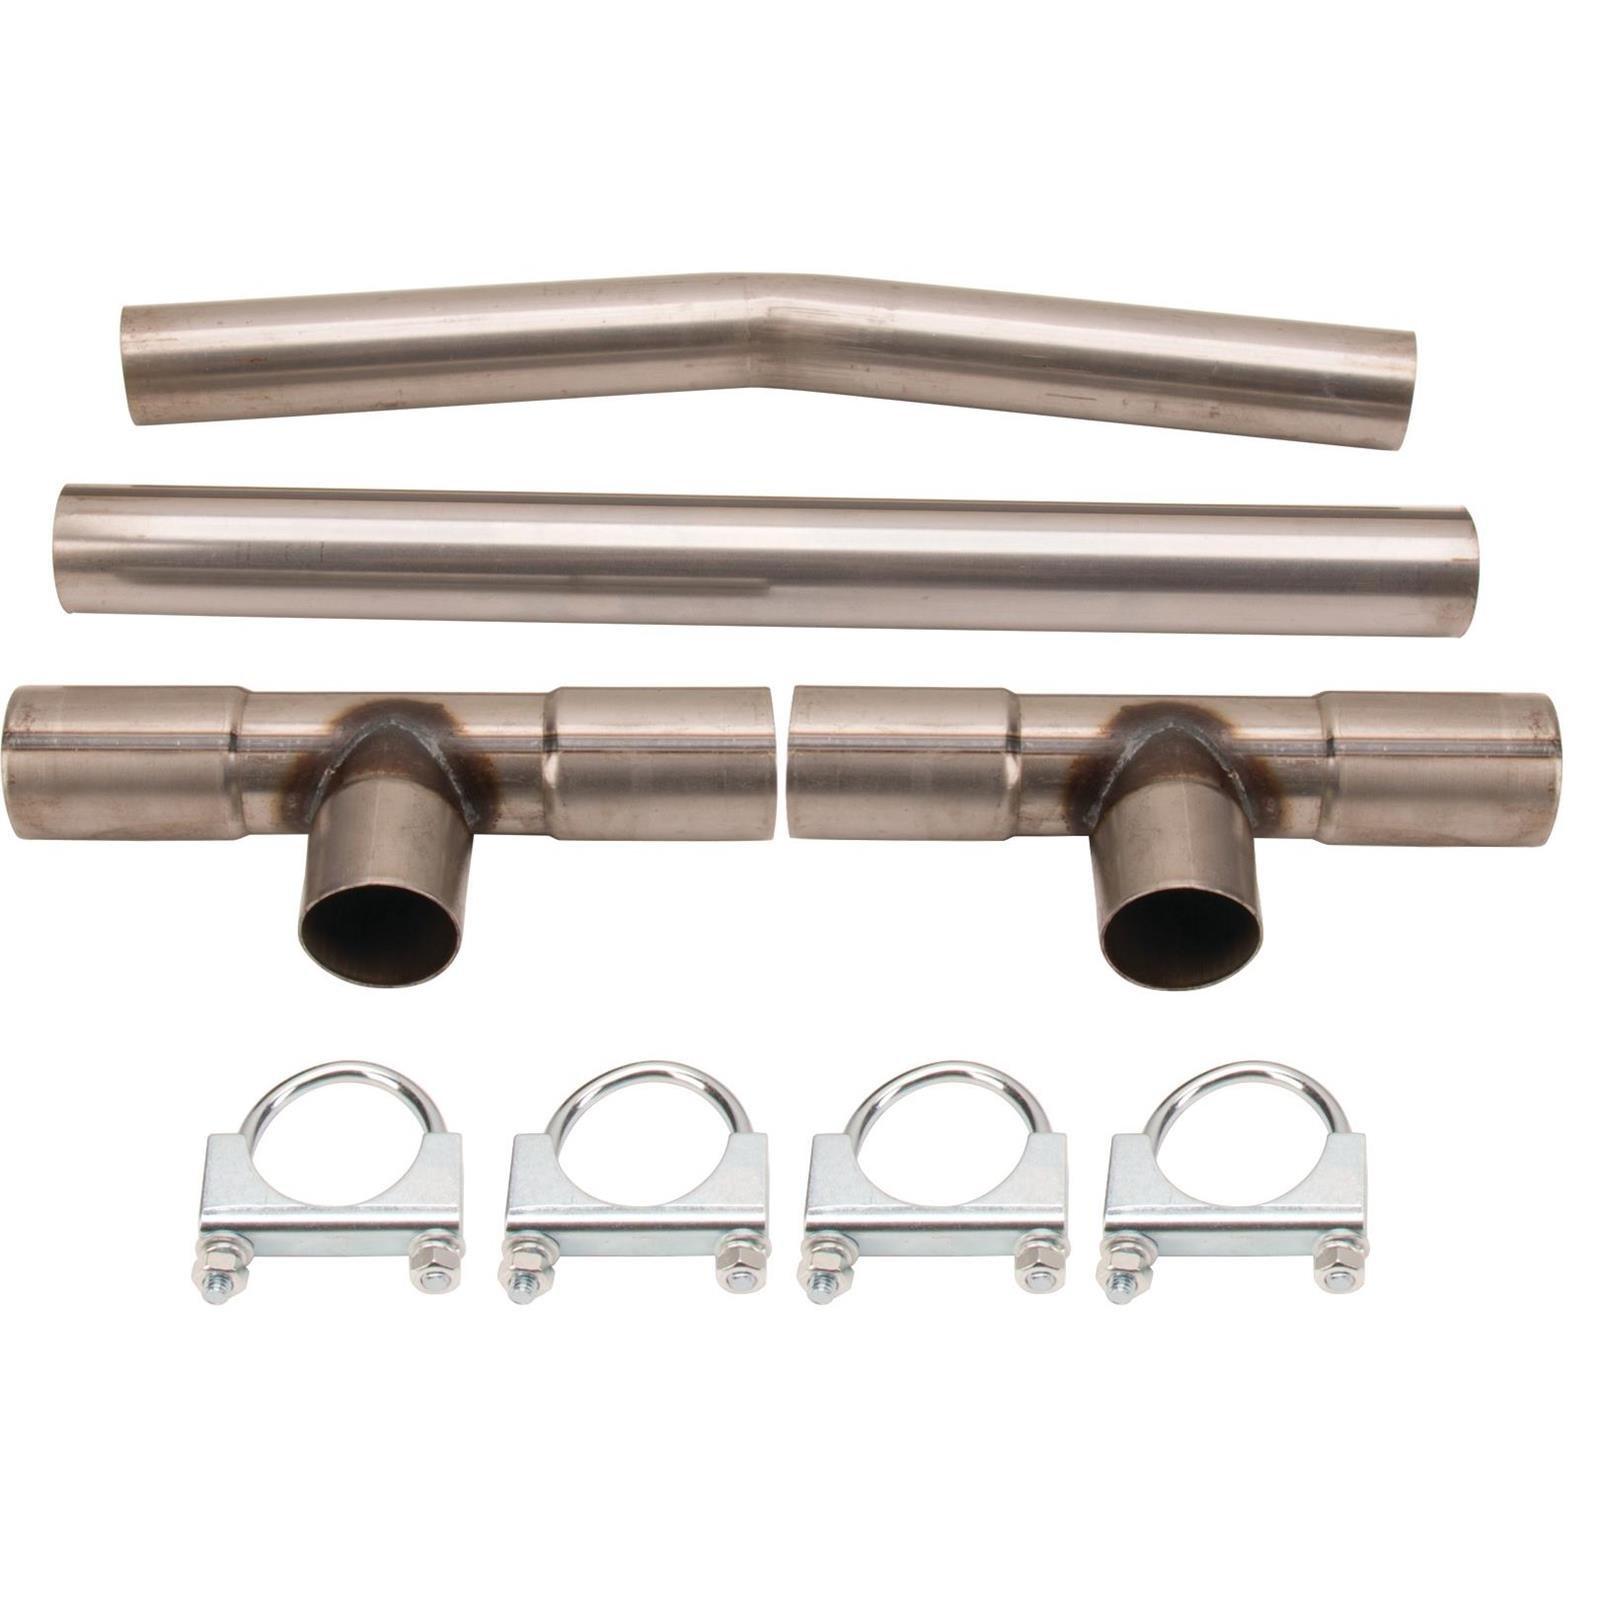 Universal Dual Exhaust H-Pipe Balance Tube Kit, 2-1/4 Inch